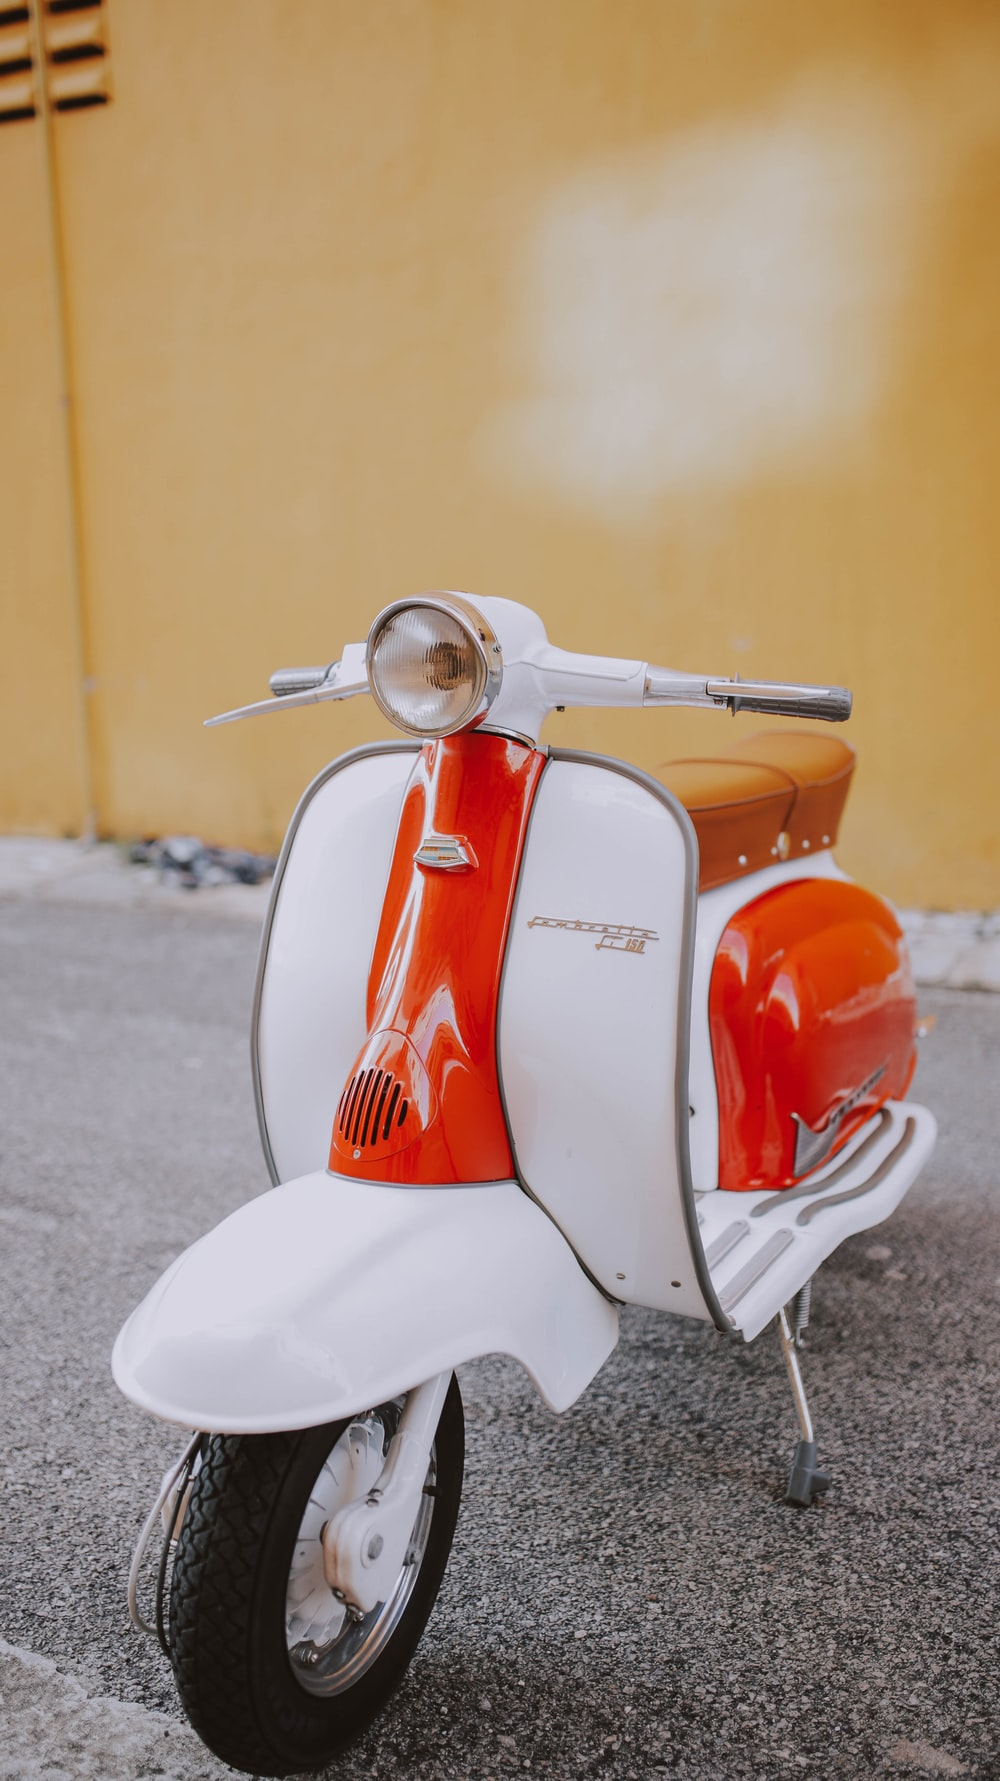 white and orange motor scooter on gray flooring